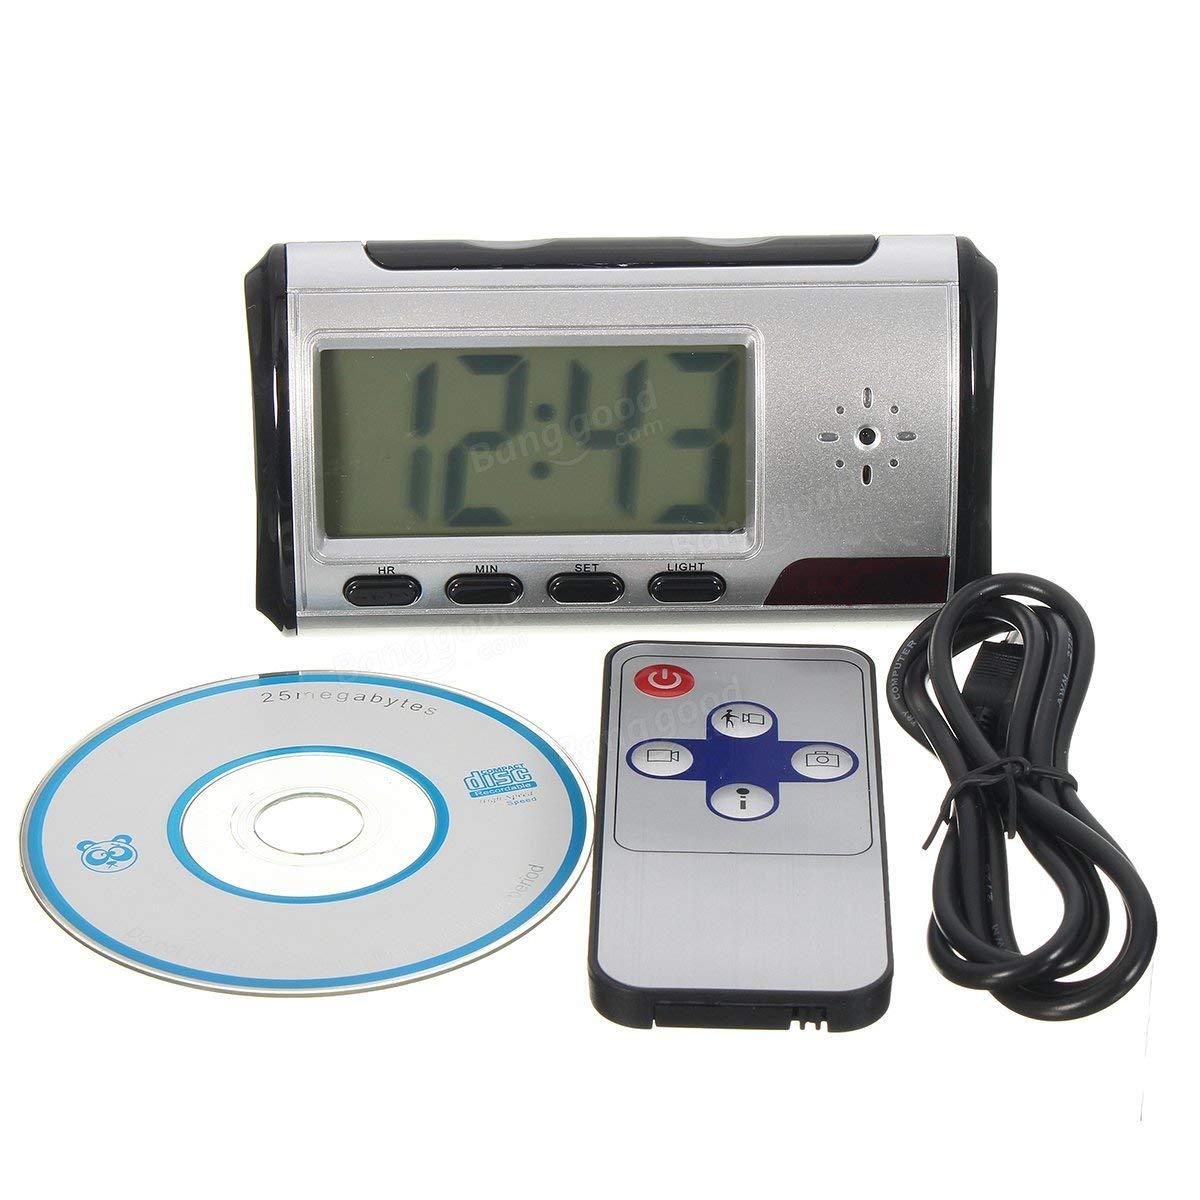 Alarm Clock Hidden Camera - Hidden Camera Alarm Clock - Hidden Camera Alarm Clock Nanny Cam Motion Detection Mini DV DVR Video (Alarm Clock With Hidden Camera)